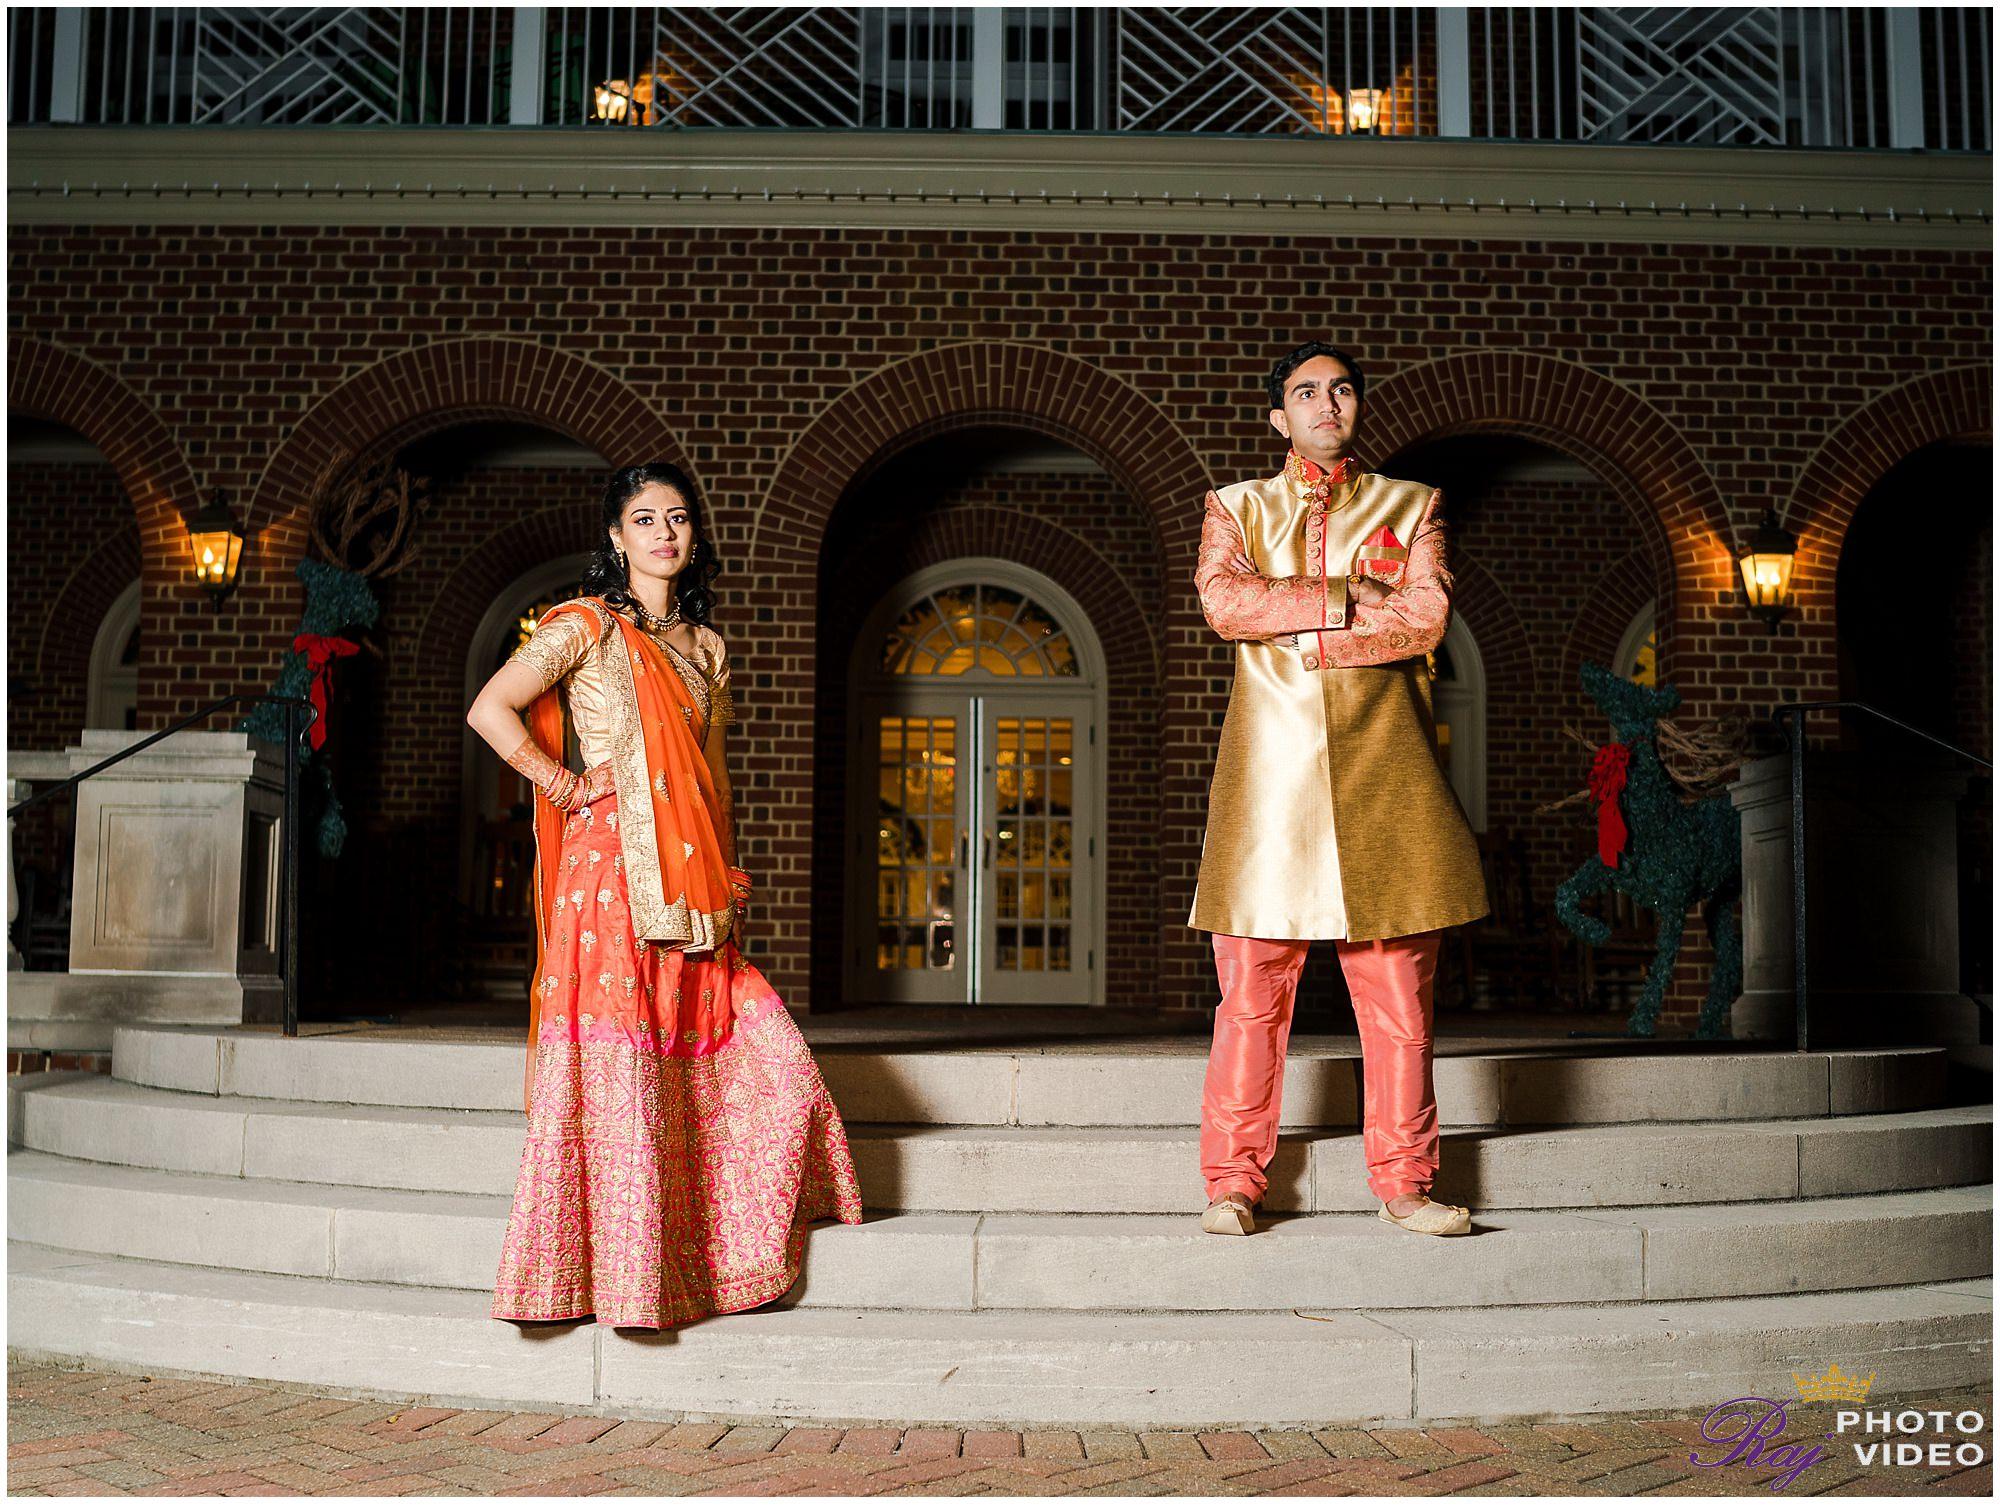 Founders-Inn-and-Spa-Virginia-Beach-VA-Indian-Wedding-Harini-Vivek-9.jpg